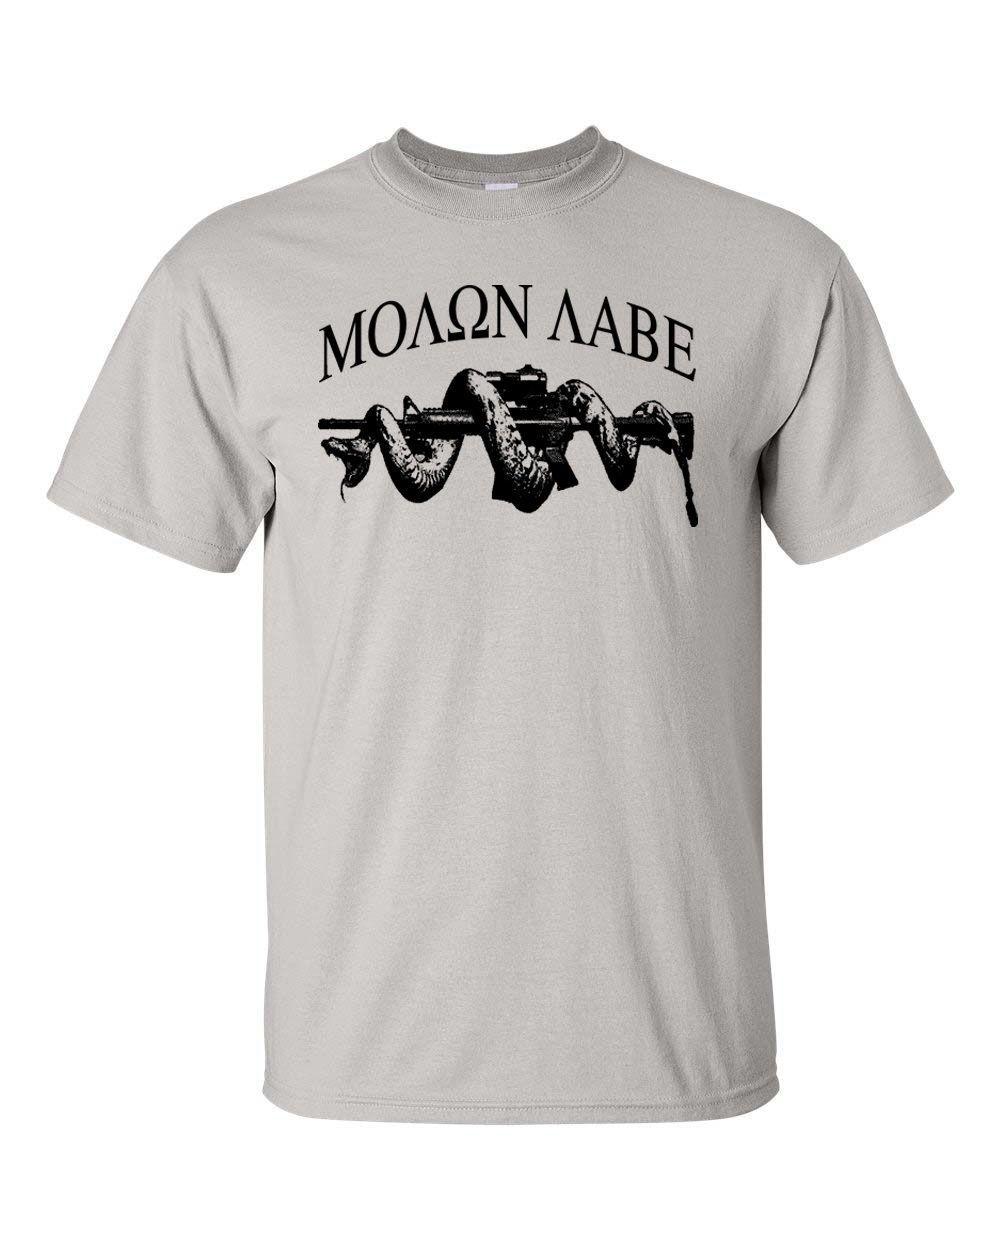 Gildan 100 Cotton T Shirts For Man Molon Labe Ar15 Snake Pro Gun Tendencies Tshirt Fast Runner Putih Xxl Control